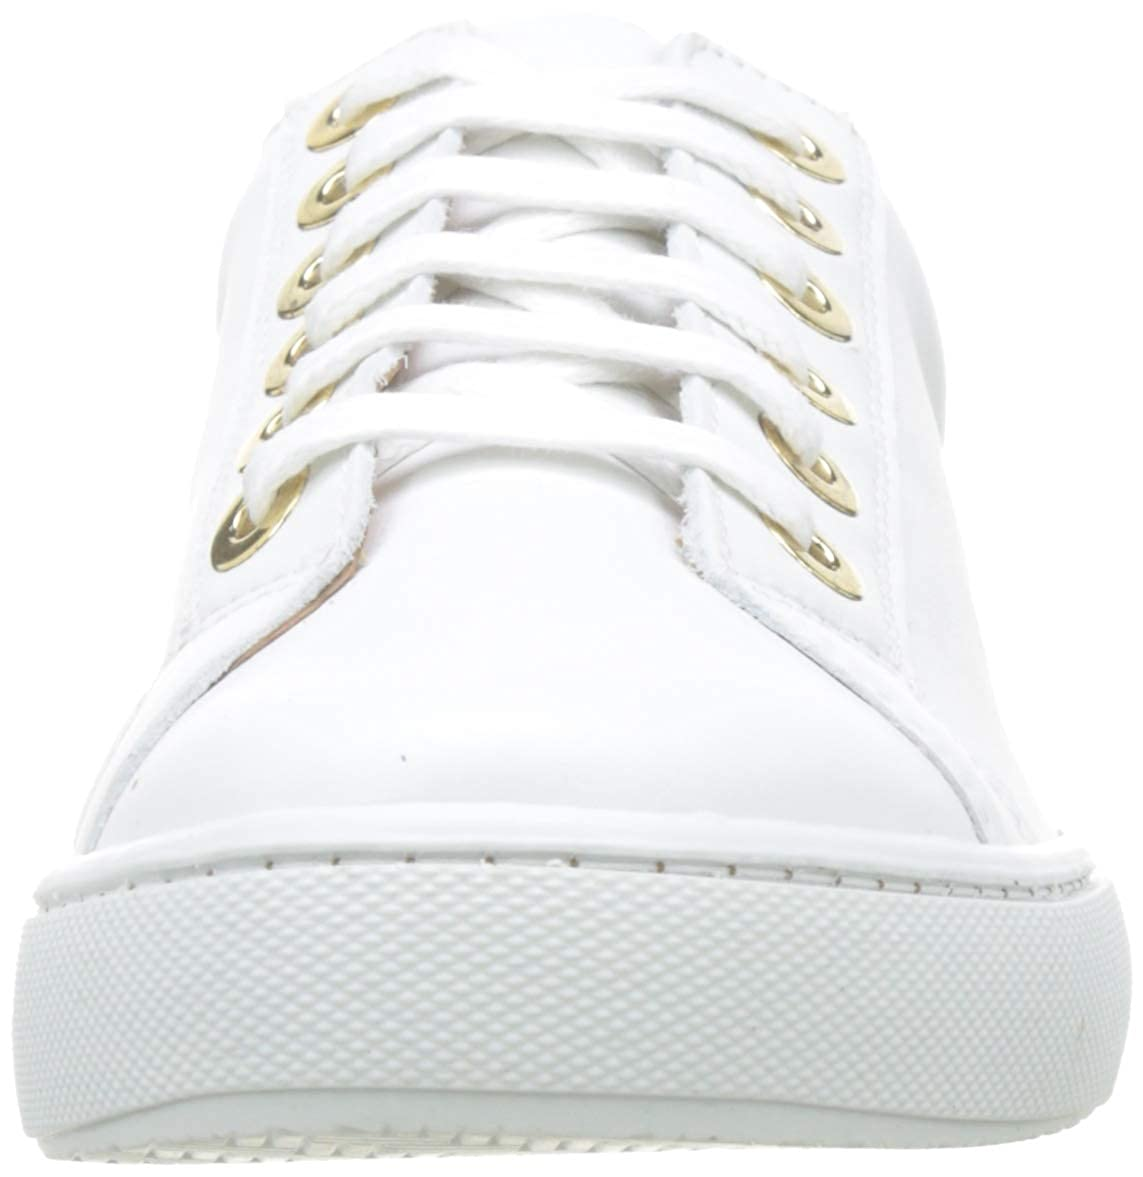 Bensimon Tennis Tennis Tennis Lacets Crantees, scarpe da ginnastica Donna be4623